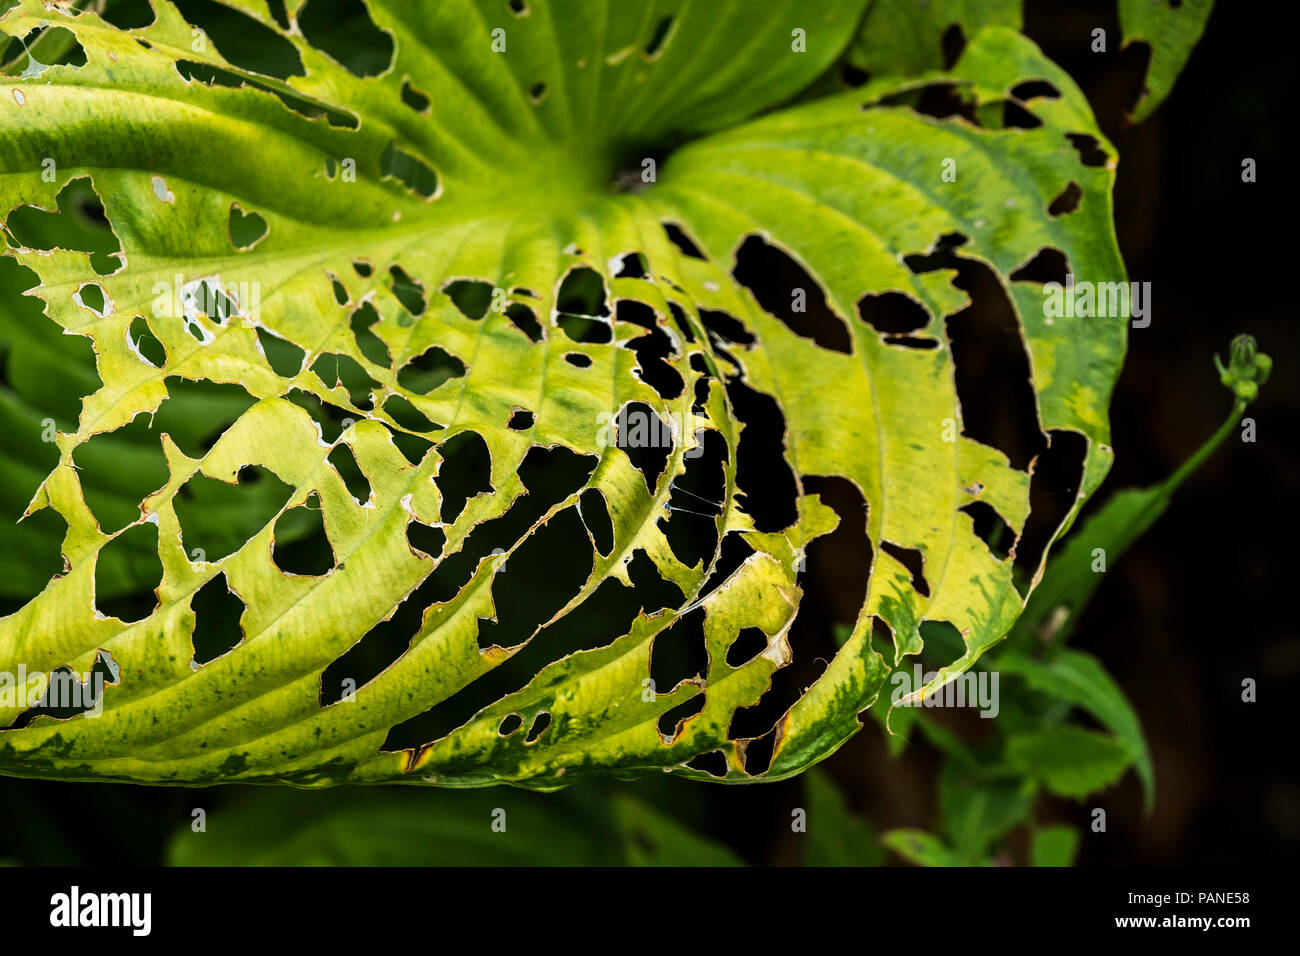 Insect slug pest damage on the leaf of a Hosta plant. - Stock Image